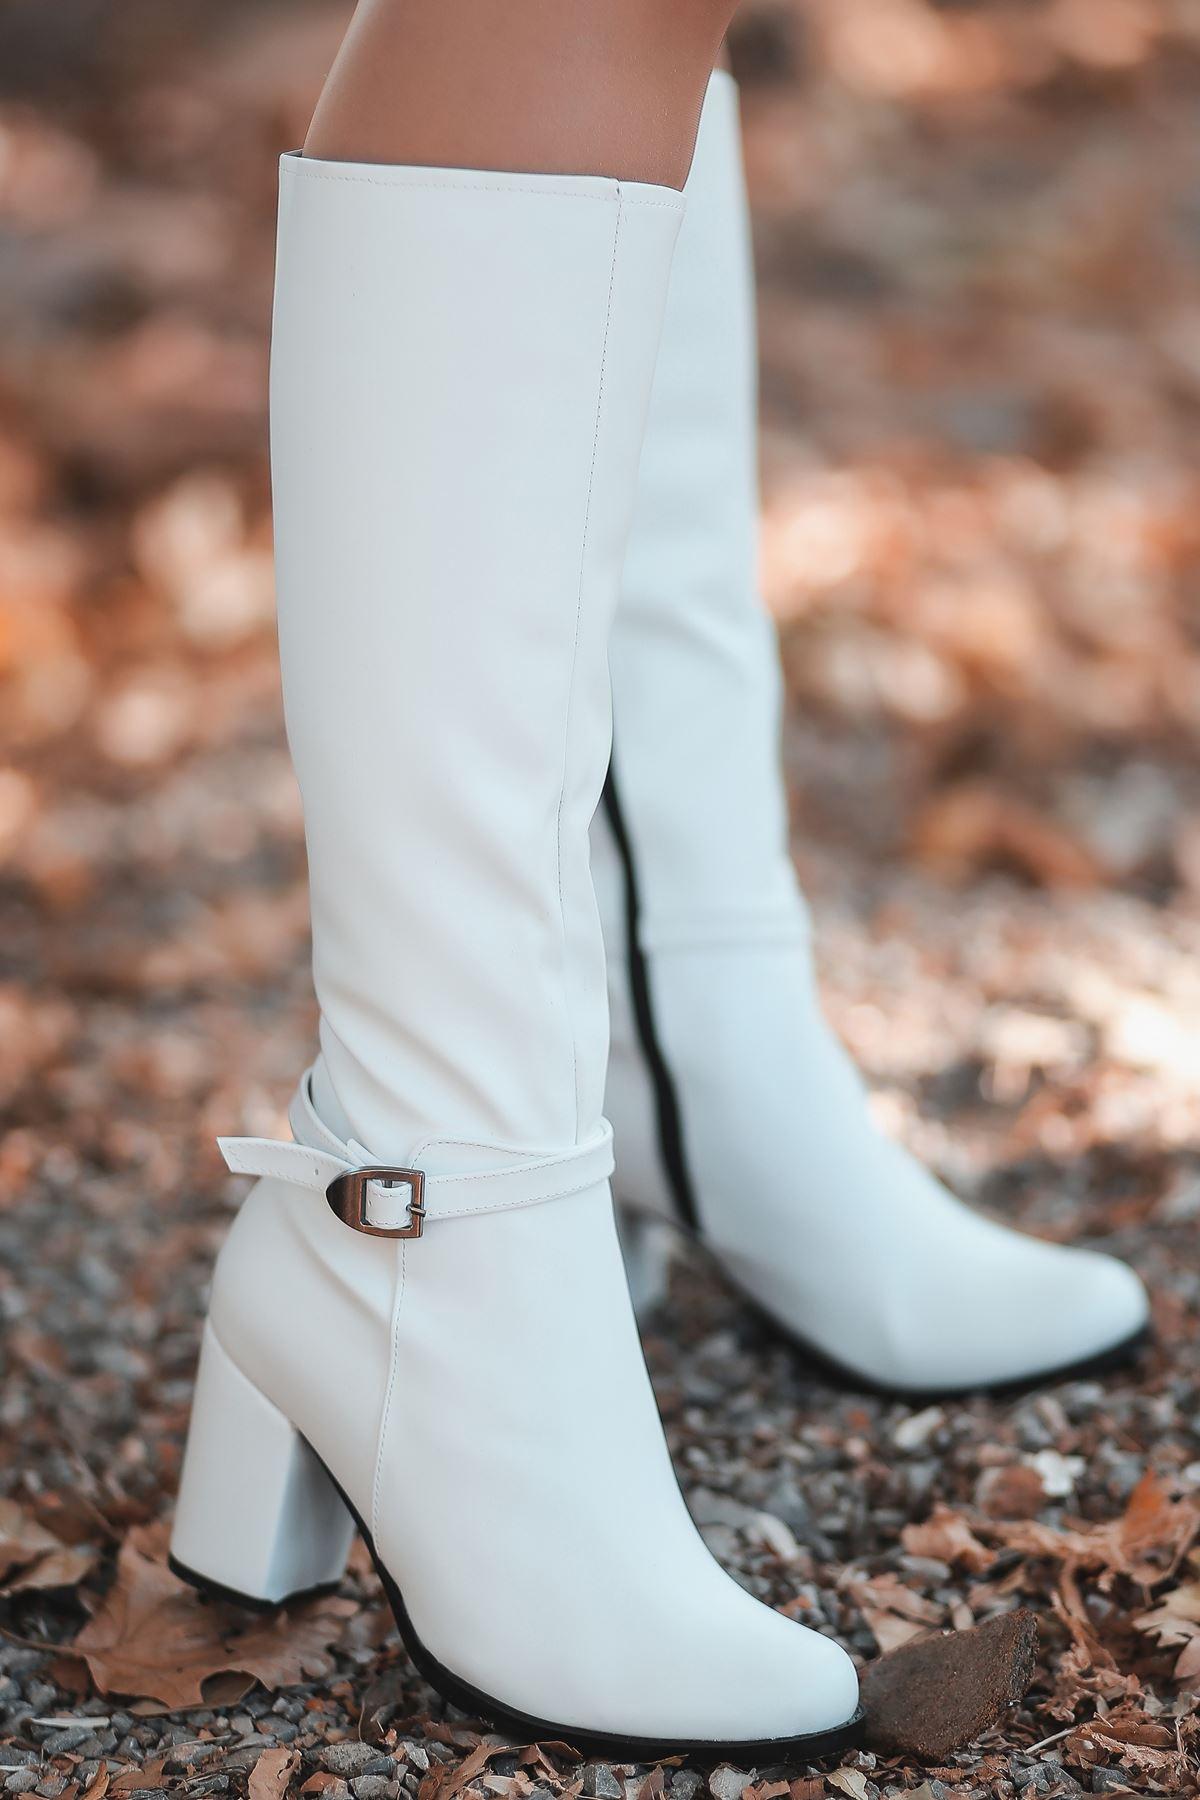 Madil Toka Detay Kadın Çizme Beyaz